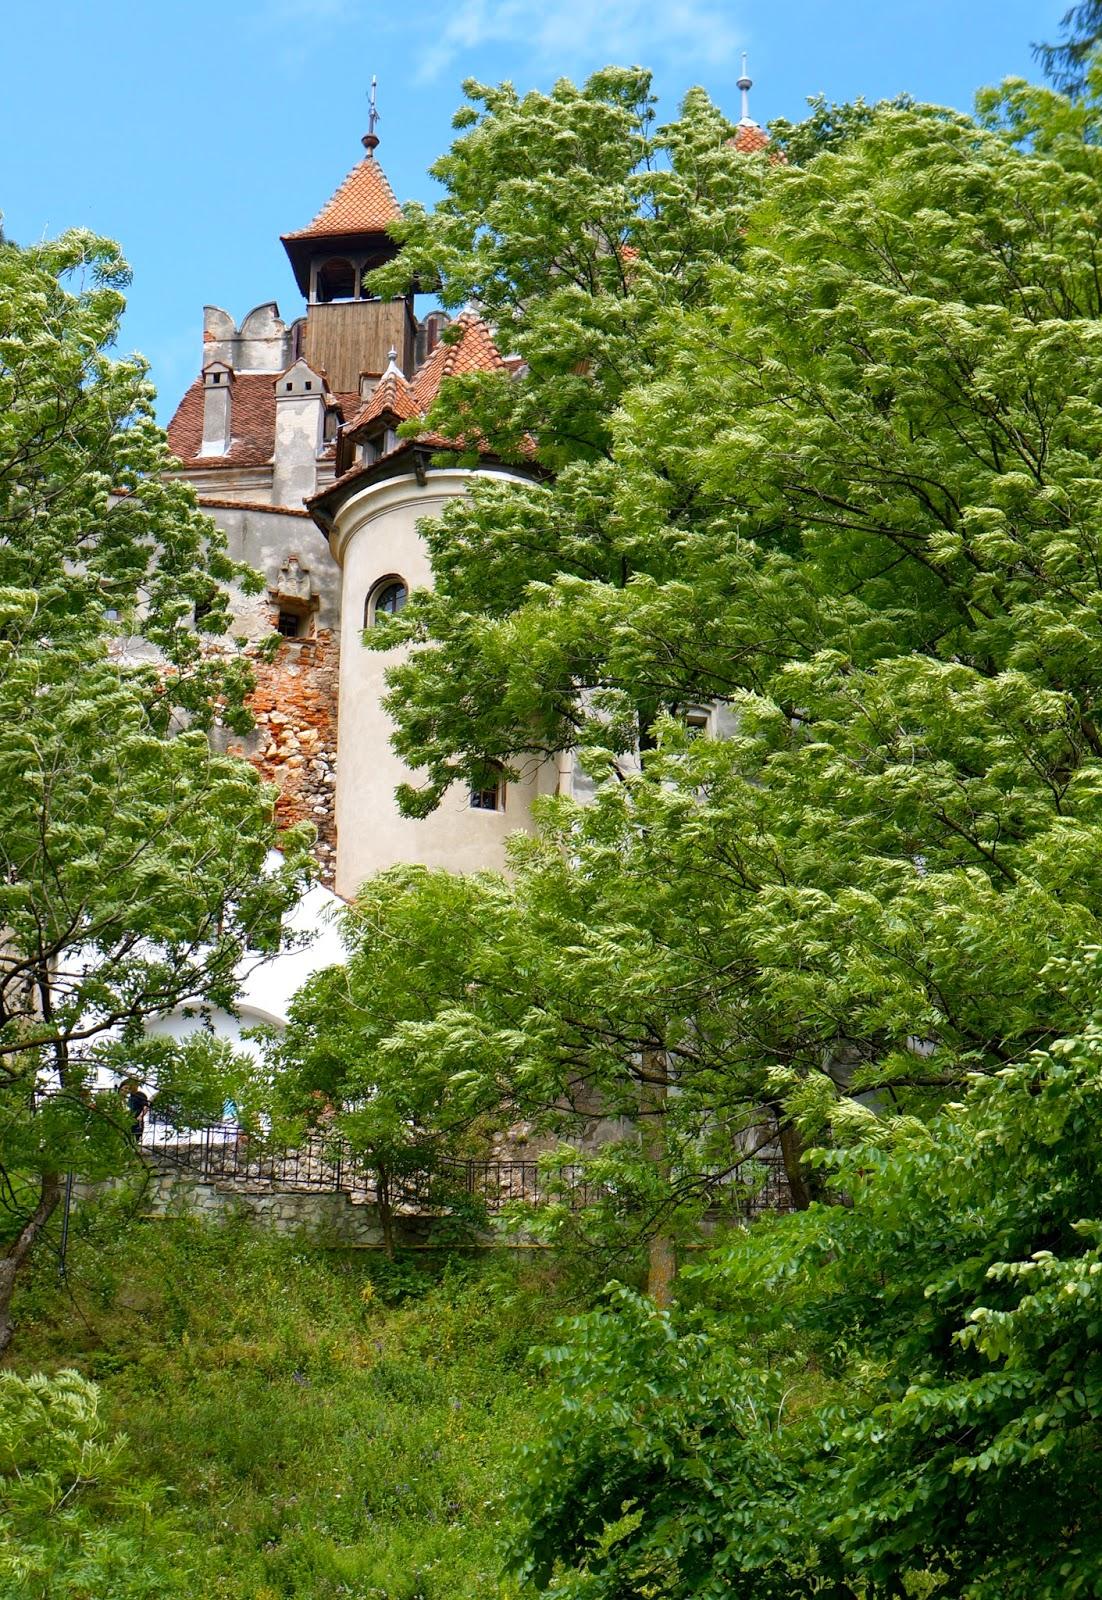 vlad tepes,bran castle,dracula's castle,count draclua,vlad the impaler